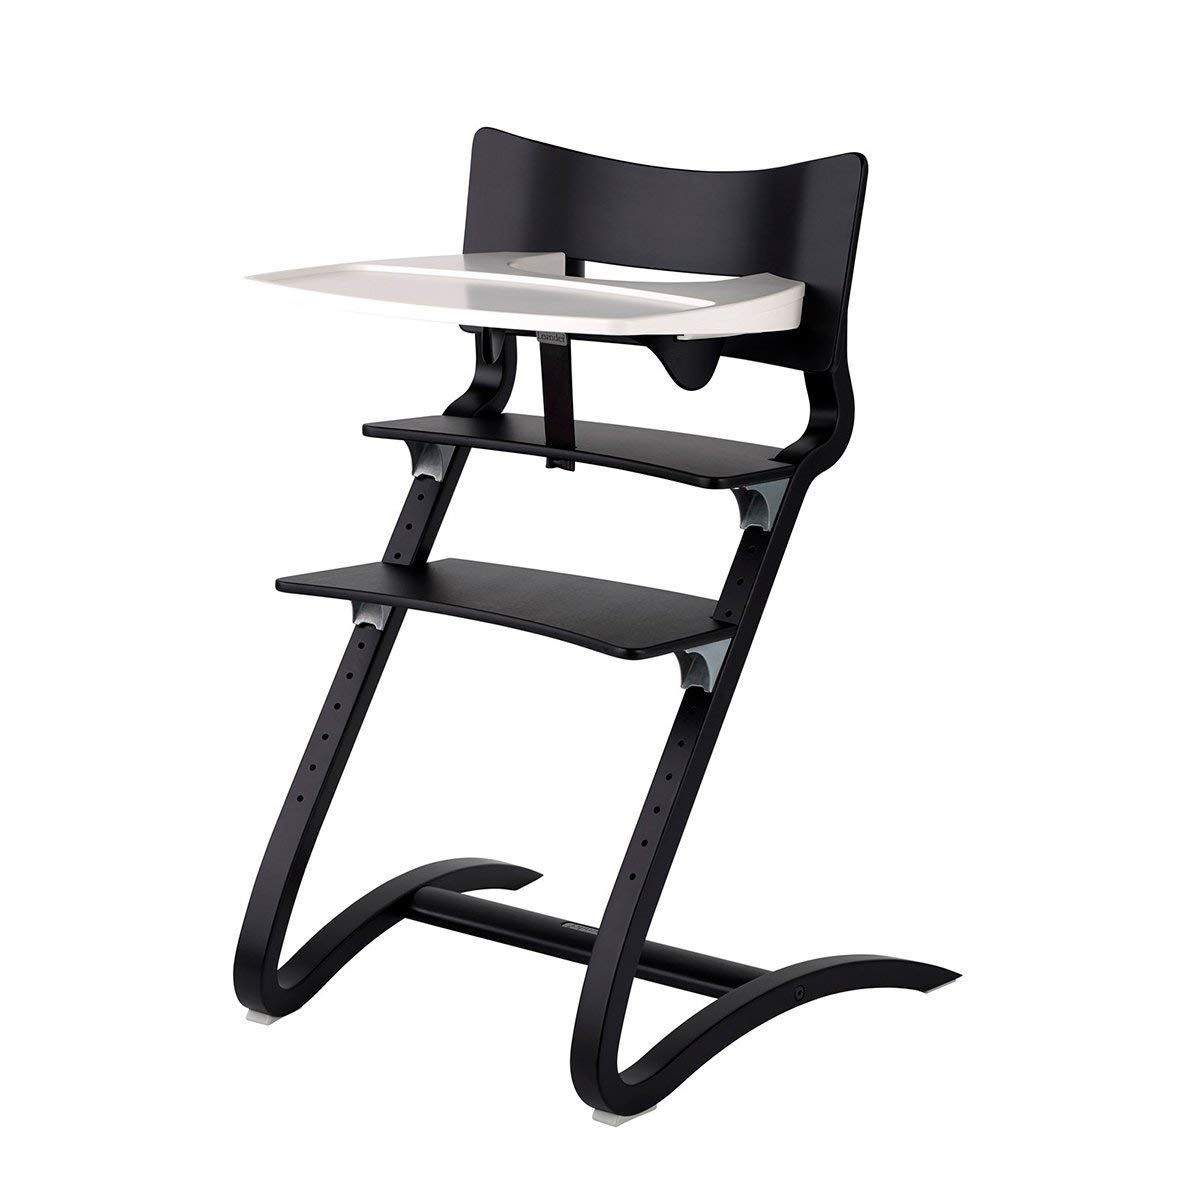 Hochstuhl Leander Stuhl wei/ß Erwachsenenstuhl mit Babyb/ügel Kissen dusty rose Tablett wei/ß Kinderstuhl